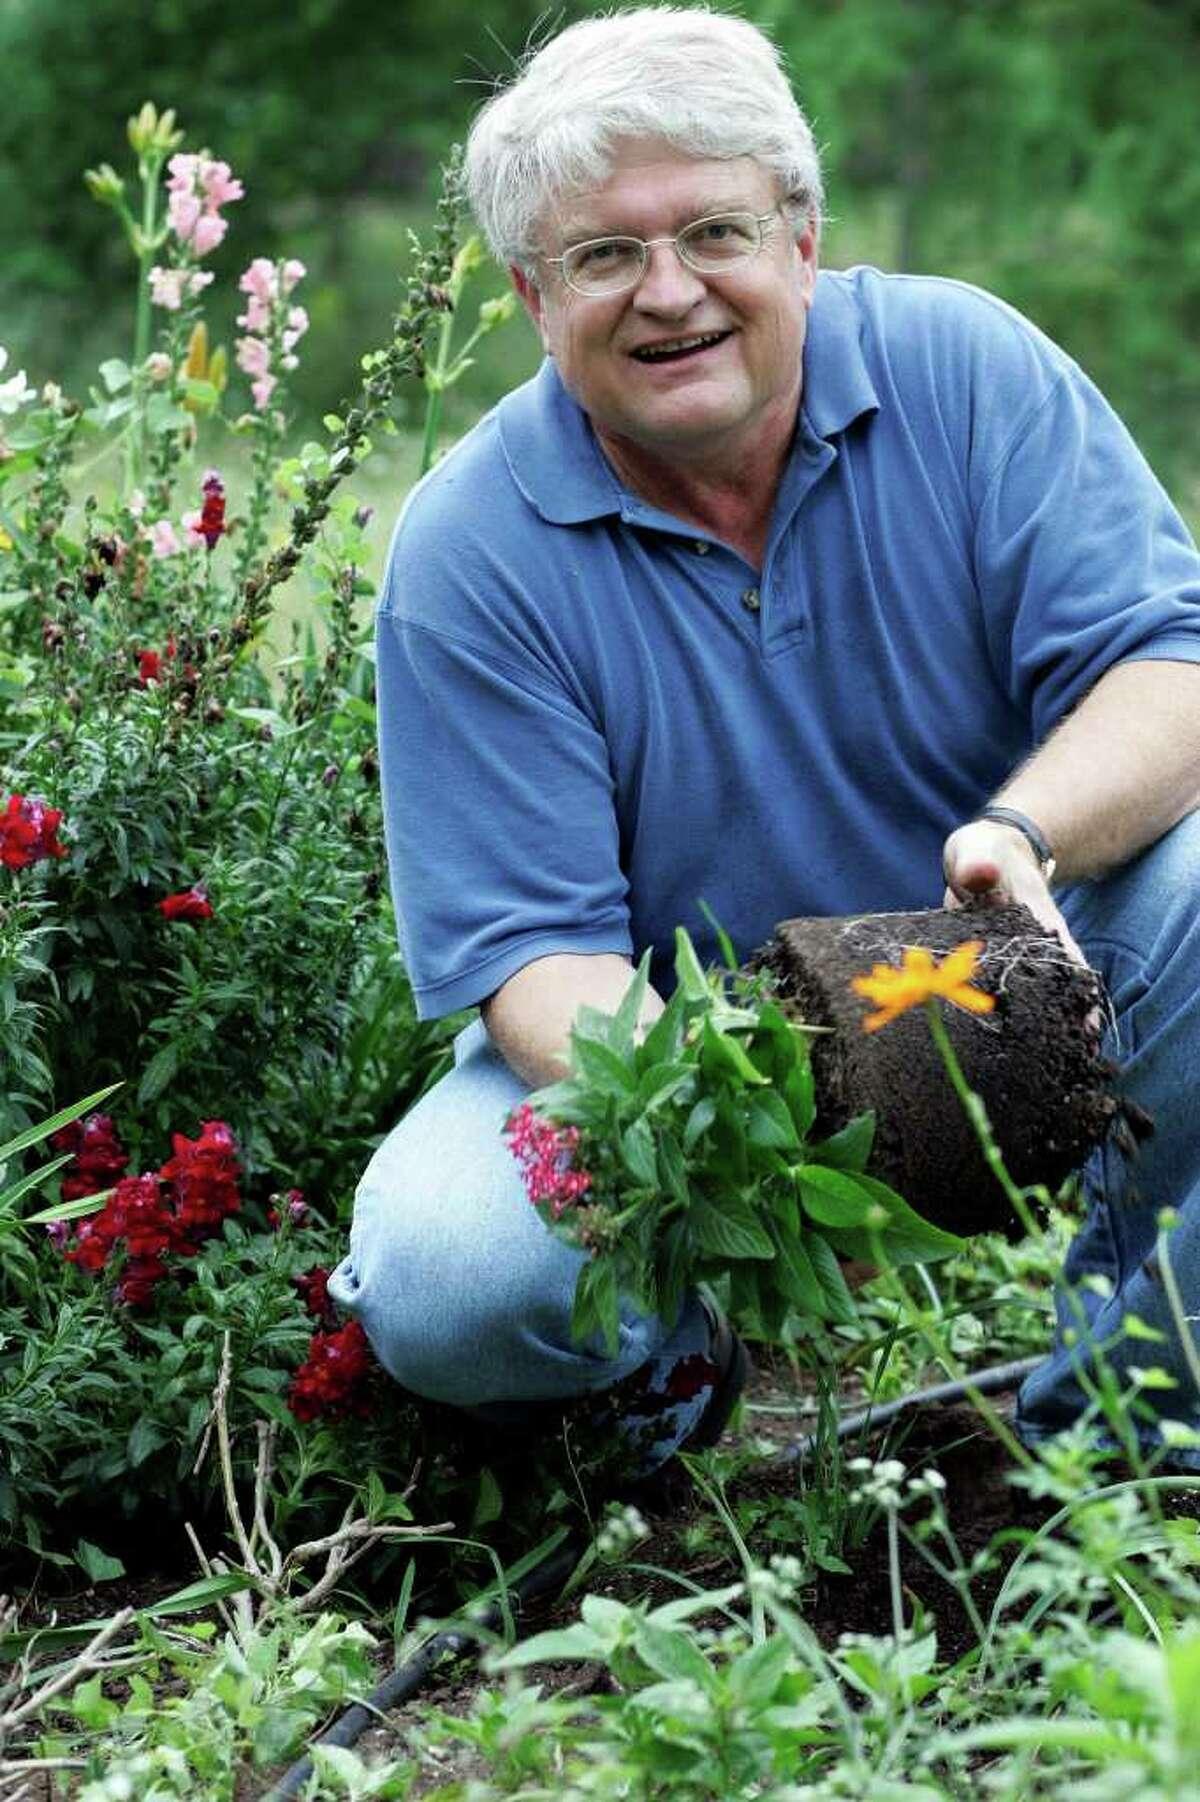 SA LIFE; GARDEN BLOG C FINCH; 05/19/05. SAWS conservation manager Calvin Finch is shown in his garden.